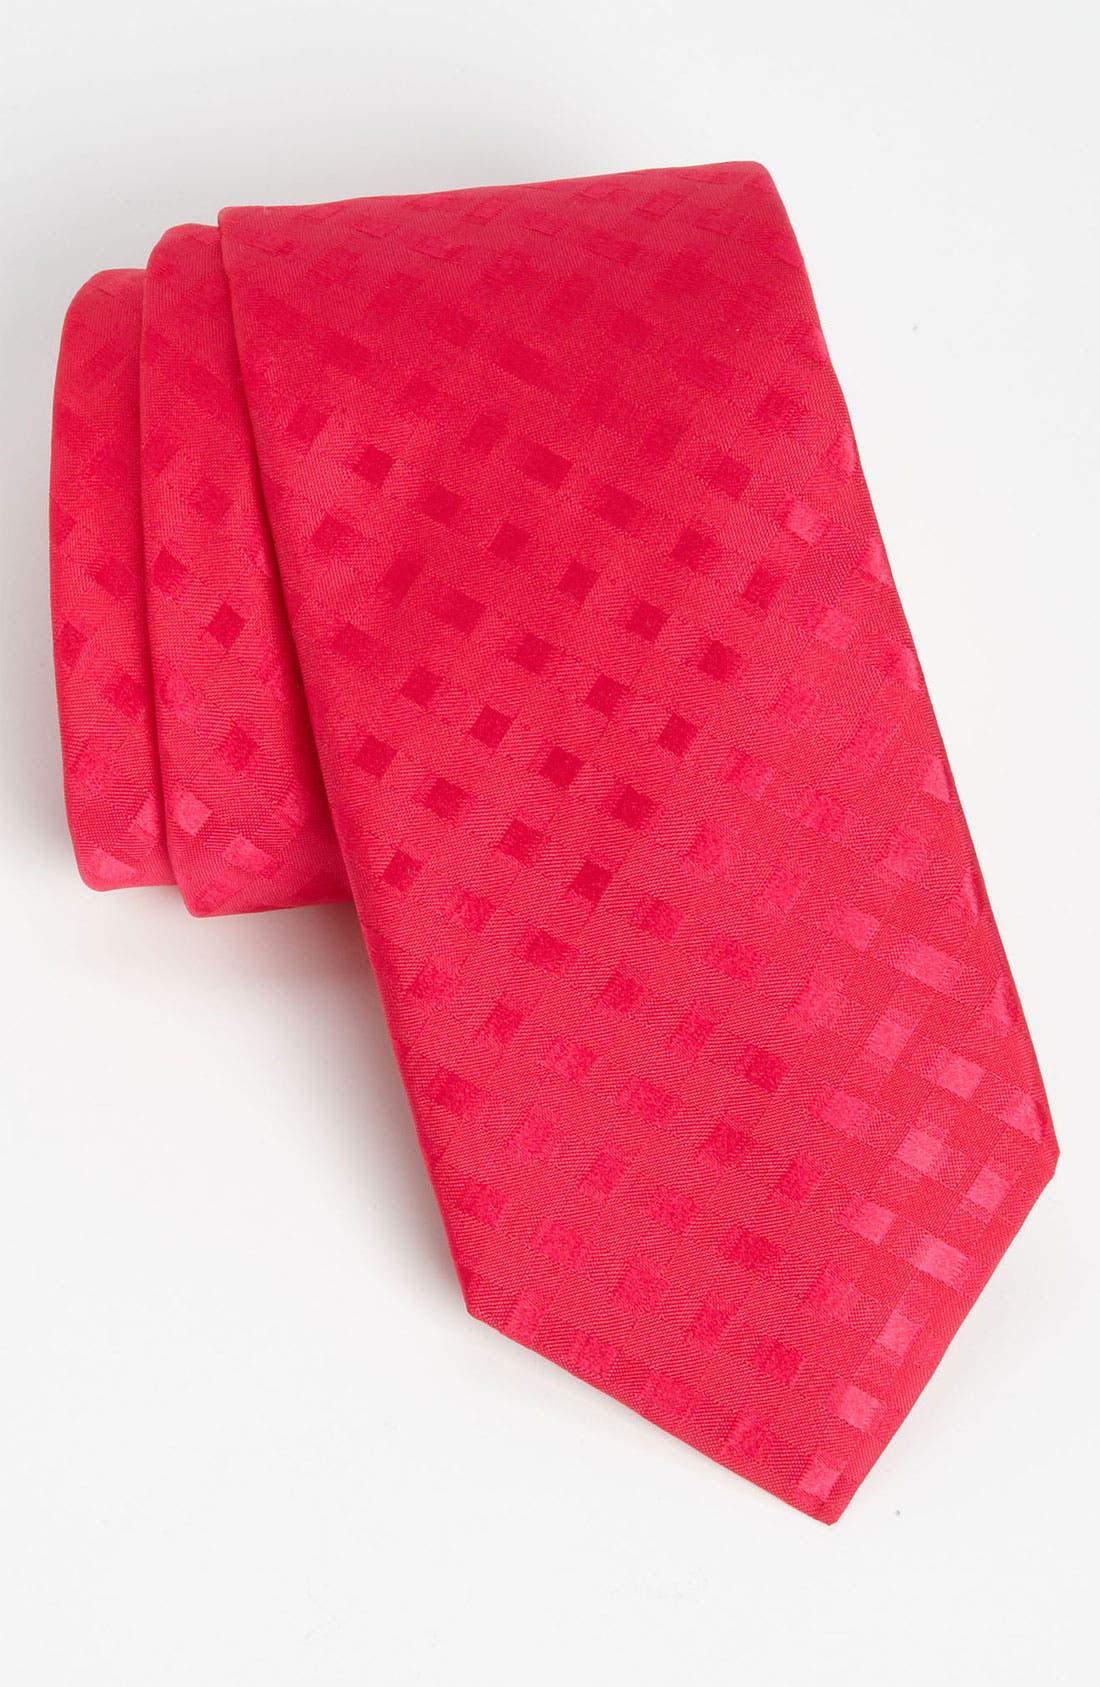 Main Image - Thomas Pink 'Lytton' Woven Silk Tie